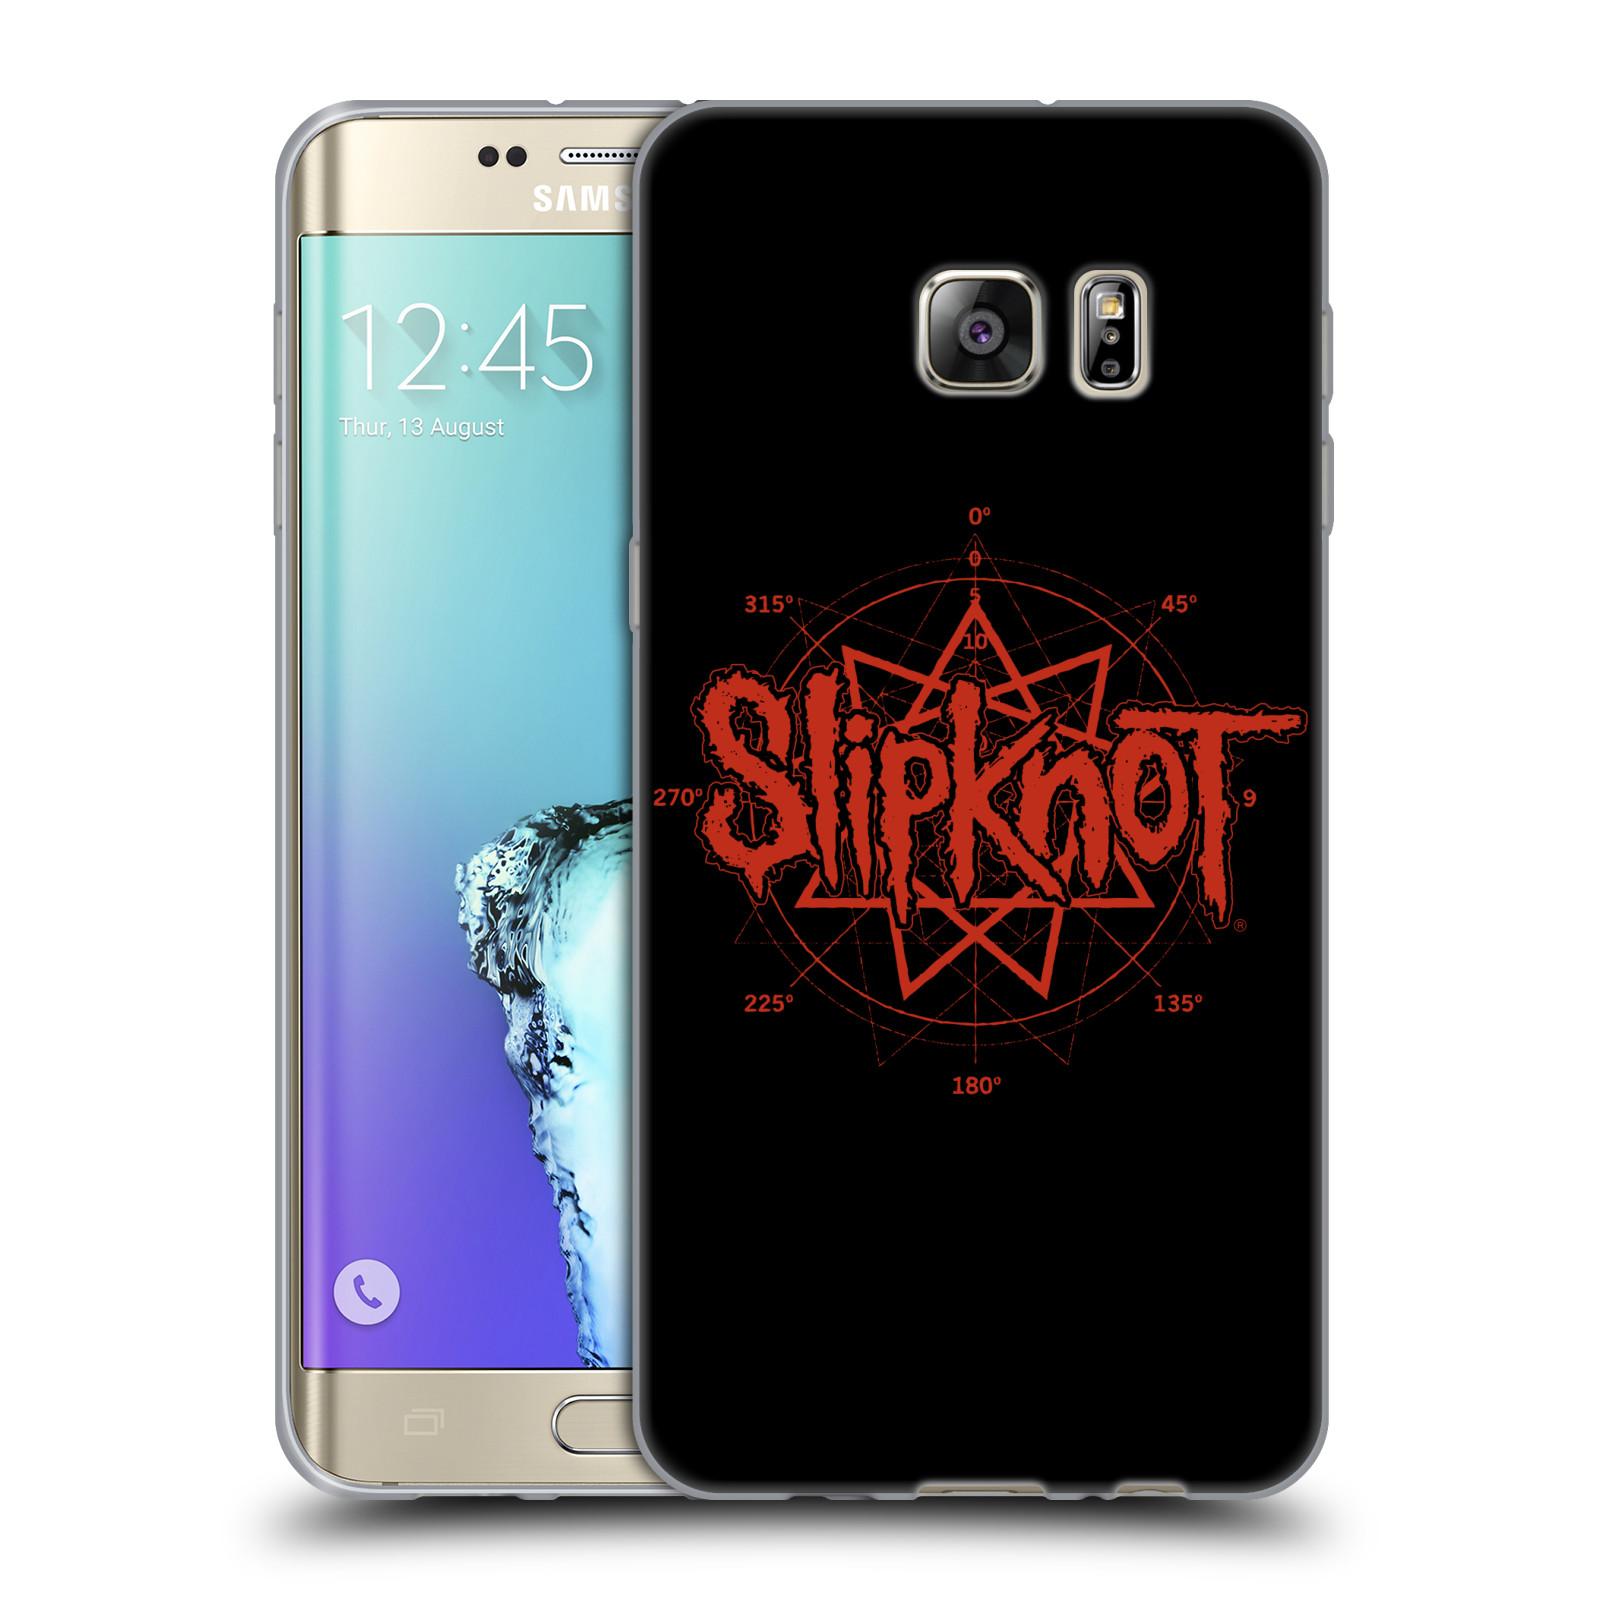 HEAD CASE silikonový obal na mobil Samsung Galaxy S6 EDGE PLUS hudební skupina Slipknot logo